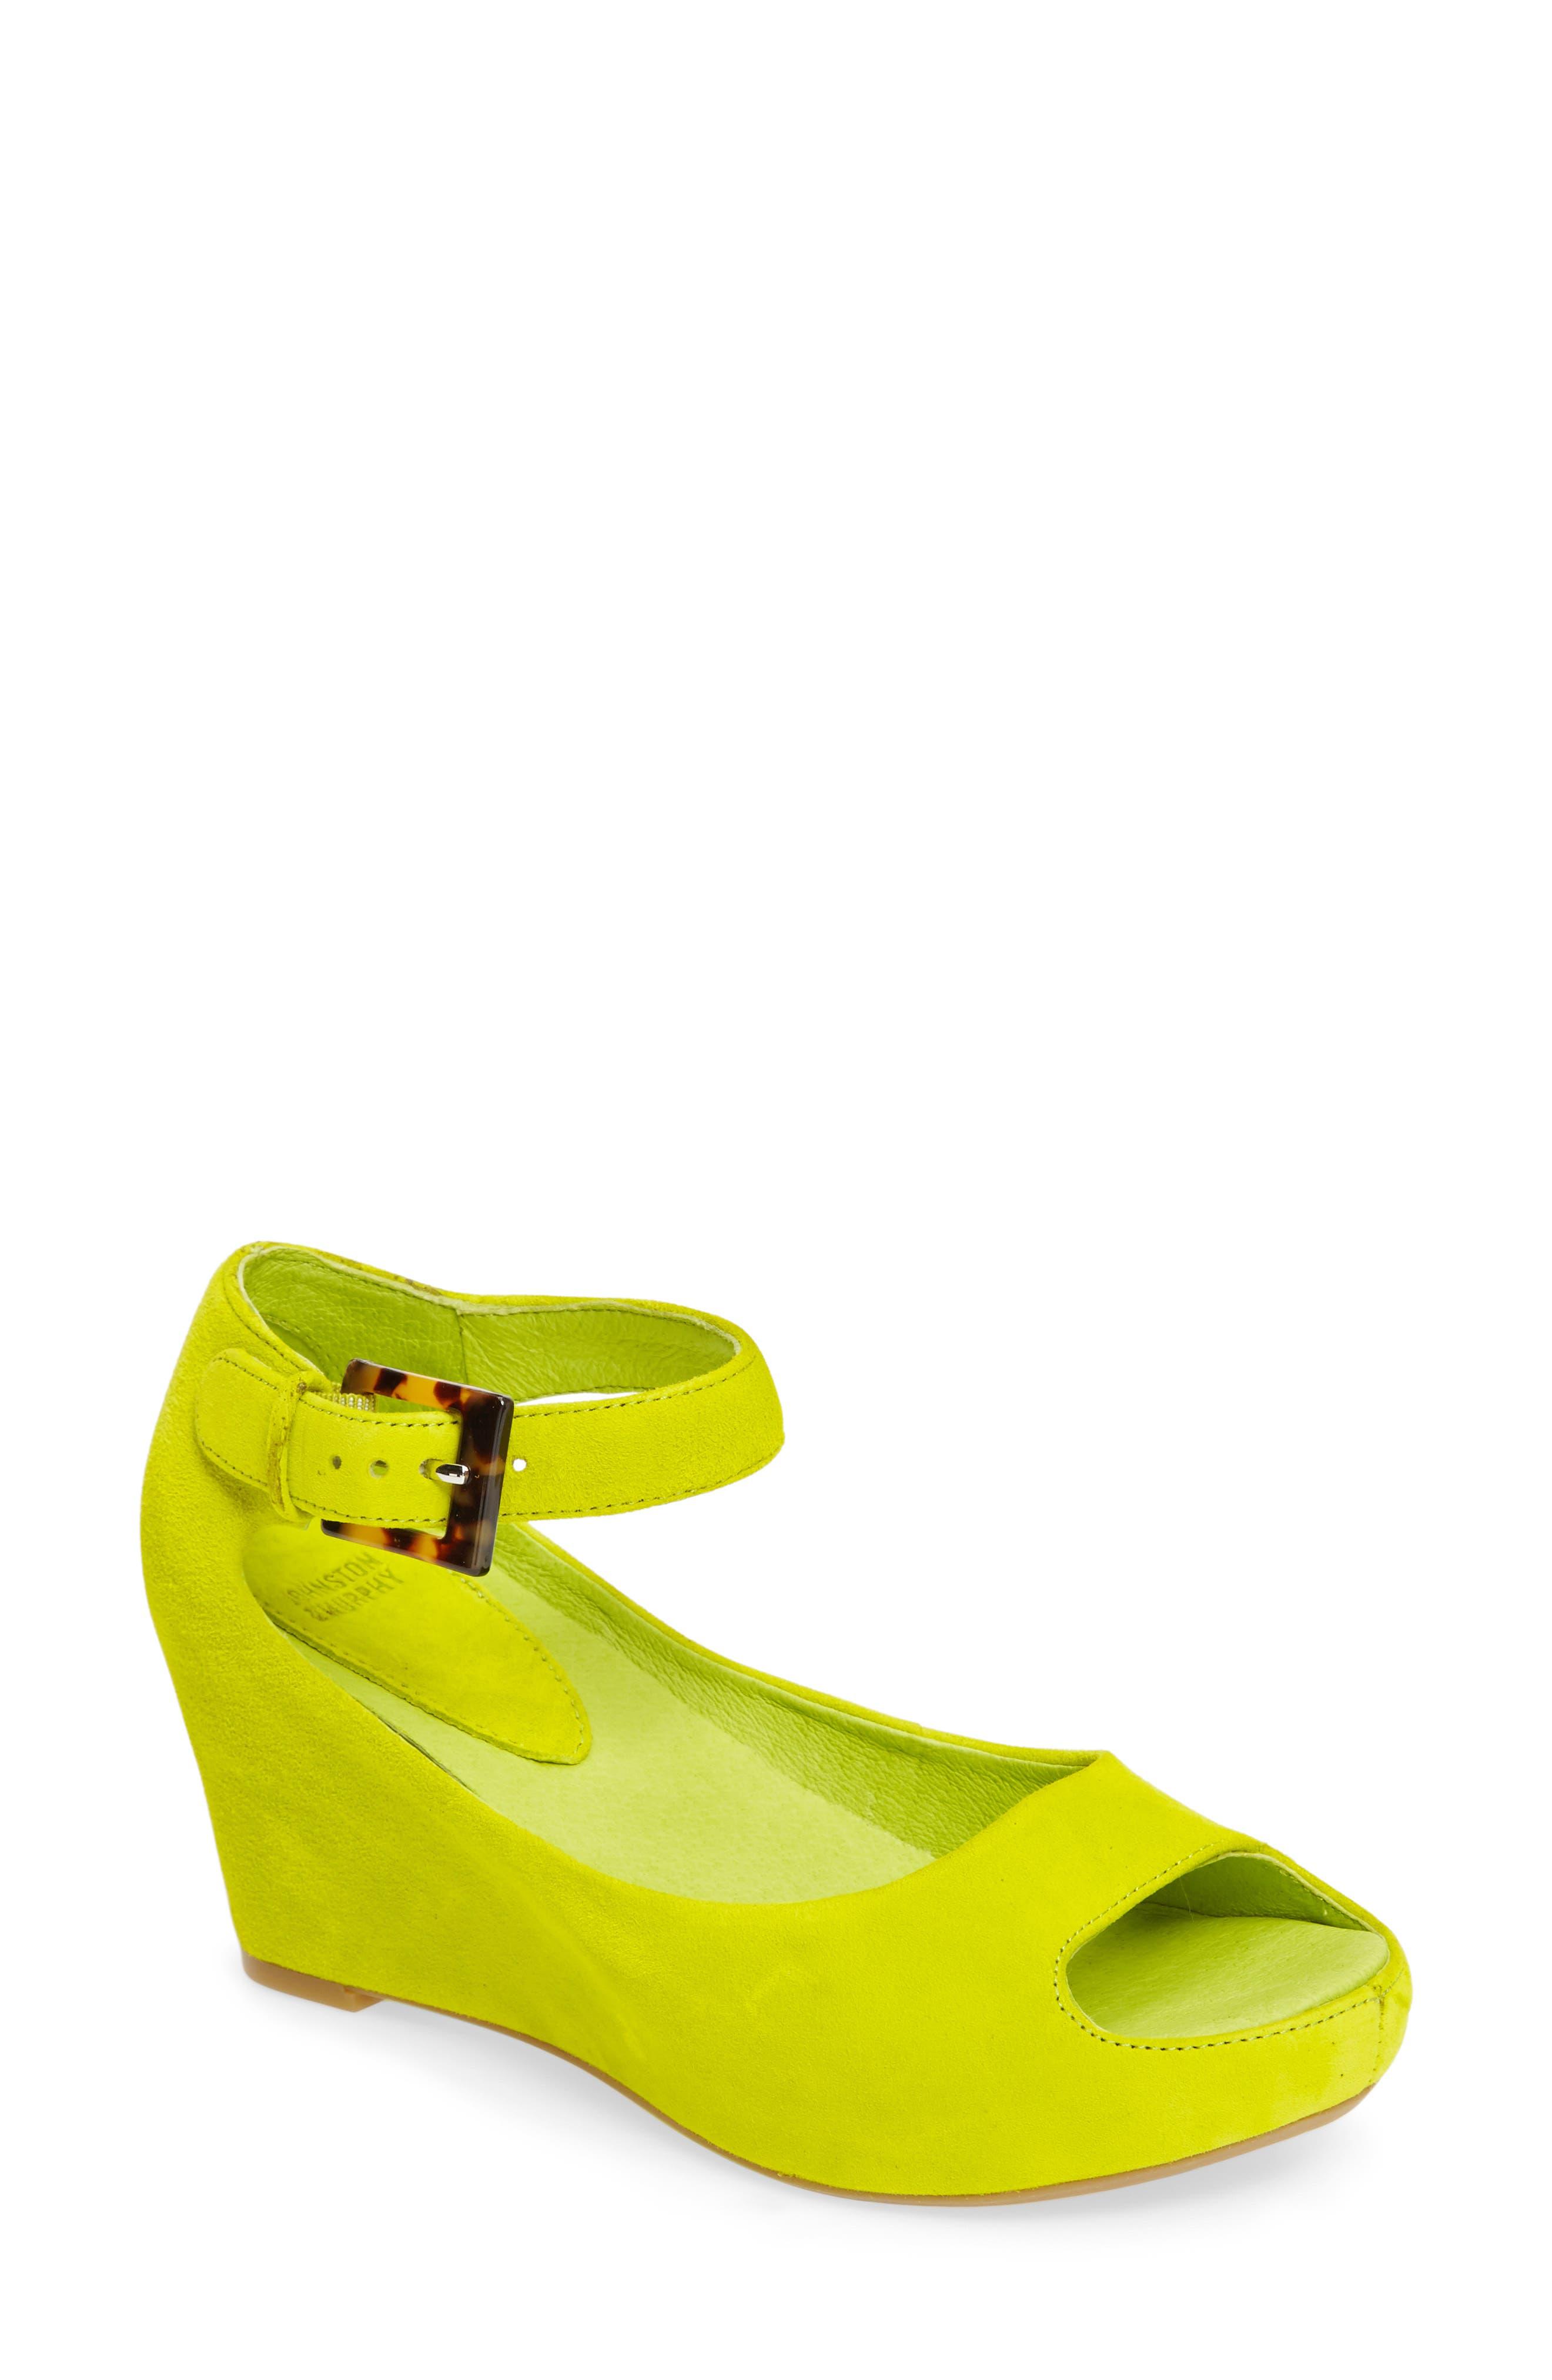 'Tricia' Ankle Strap Sandal,                             Main thumbnail 4, color,